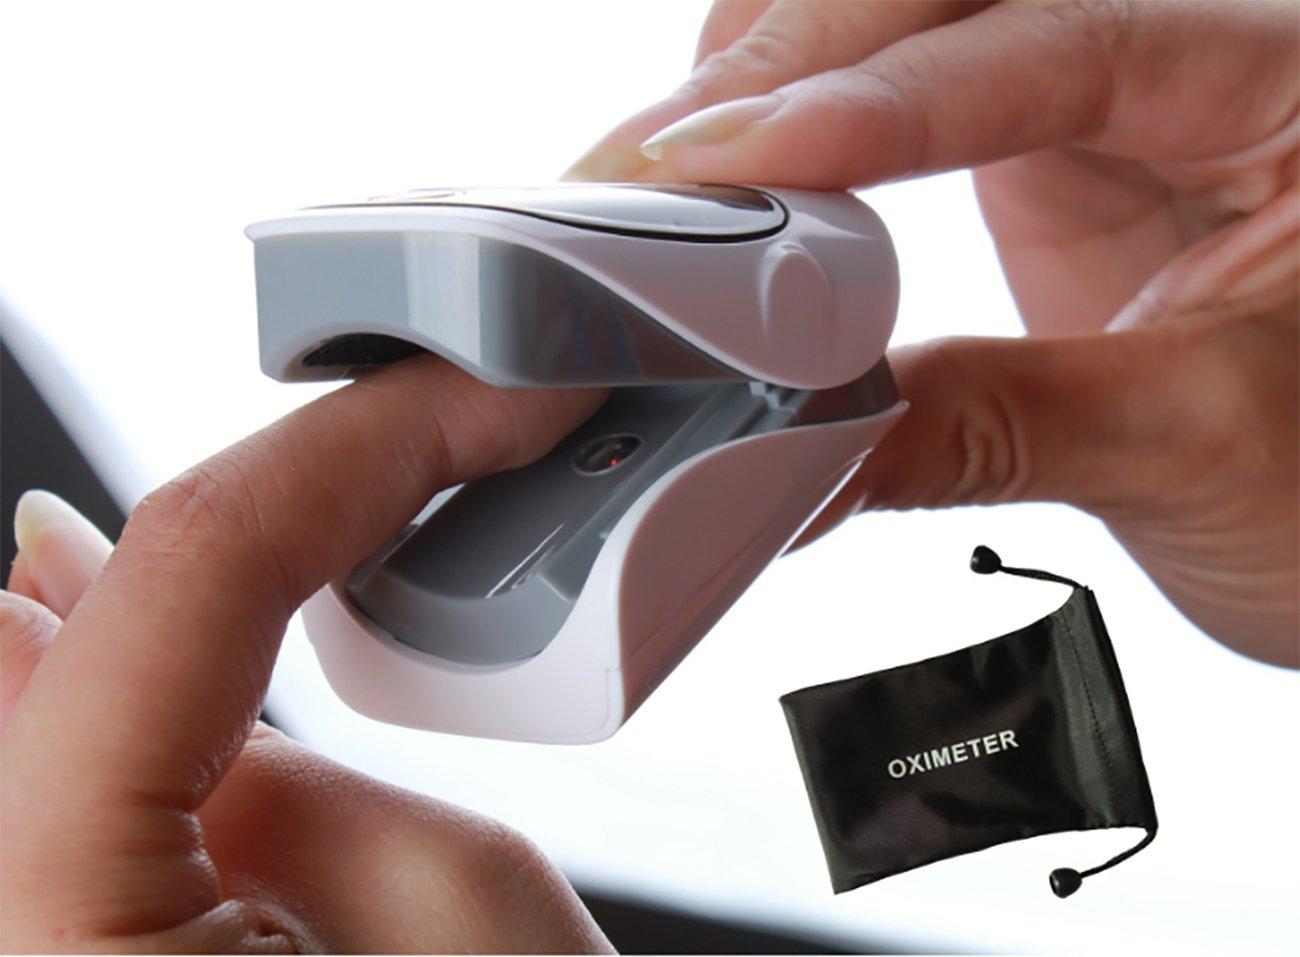 Tochange Digitales Fingerspitzen-Pulsoximeter Blutsauerstoff-Sättigungs-Monitor Bequemer Blutsauerstoff-Sättigungs-Monitor Fingerspitzen-Pulsoximeter a0ece8